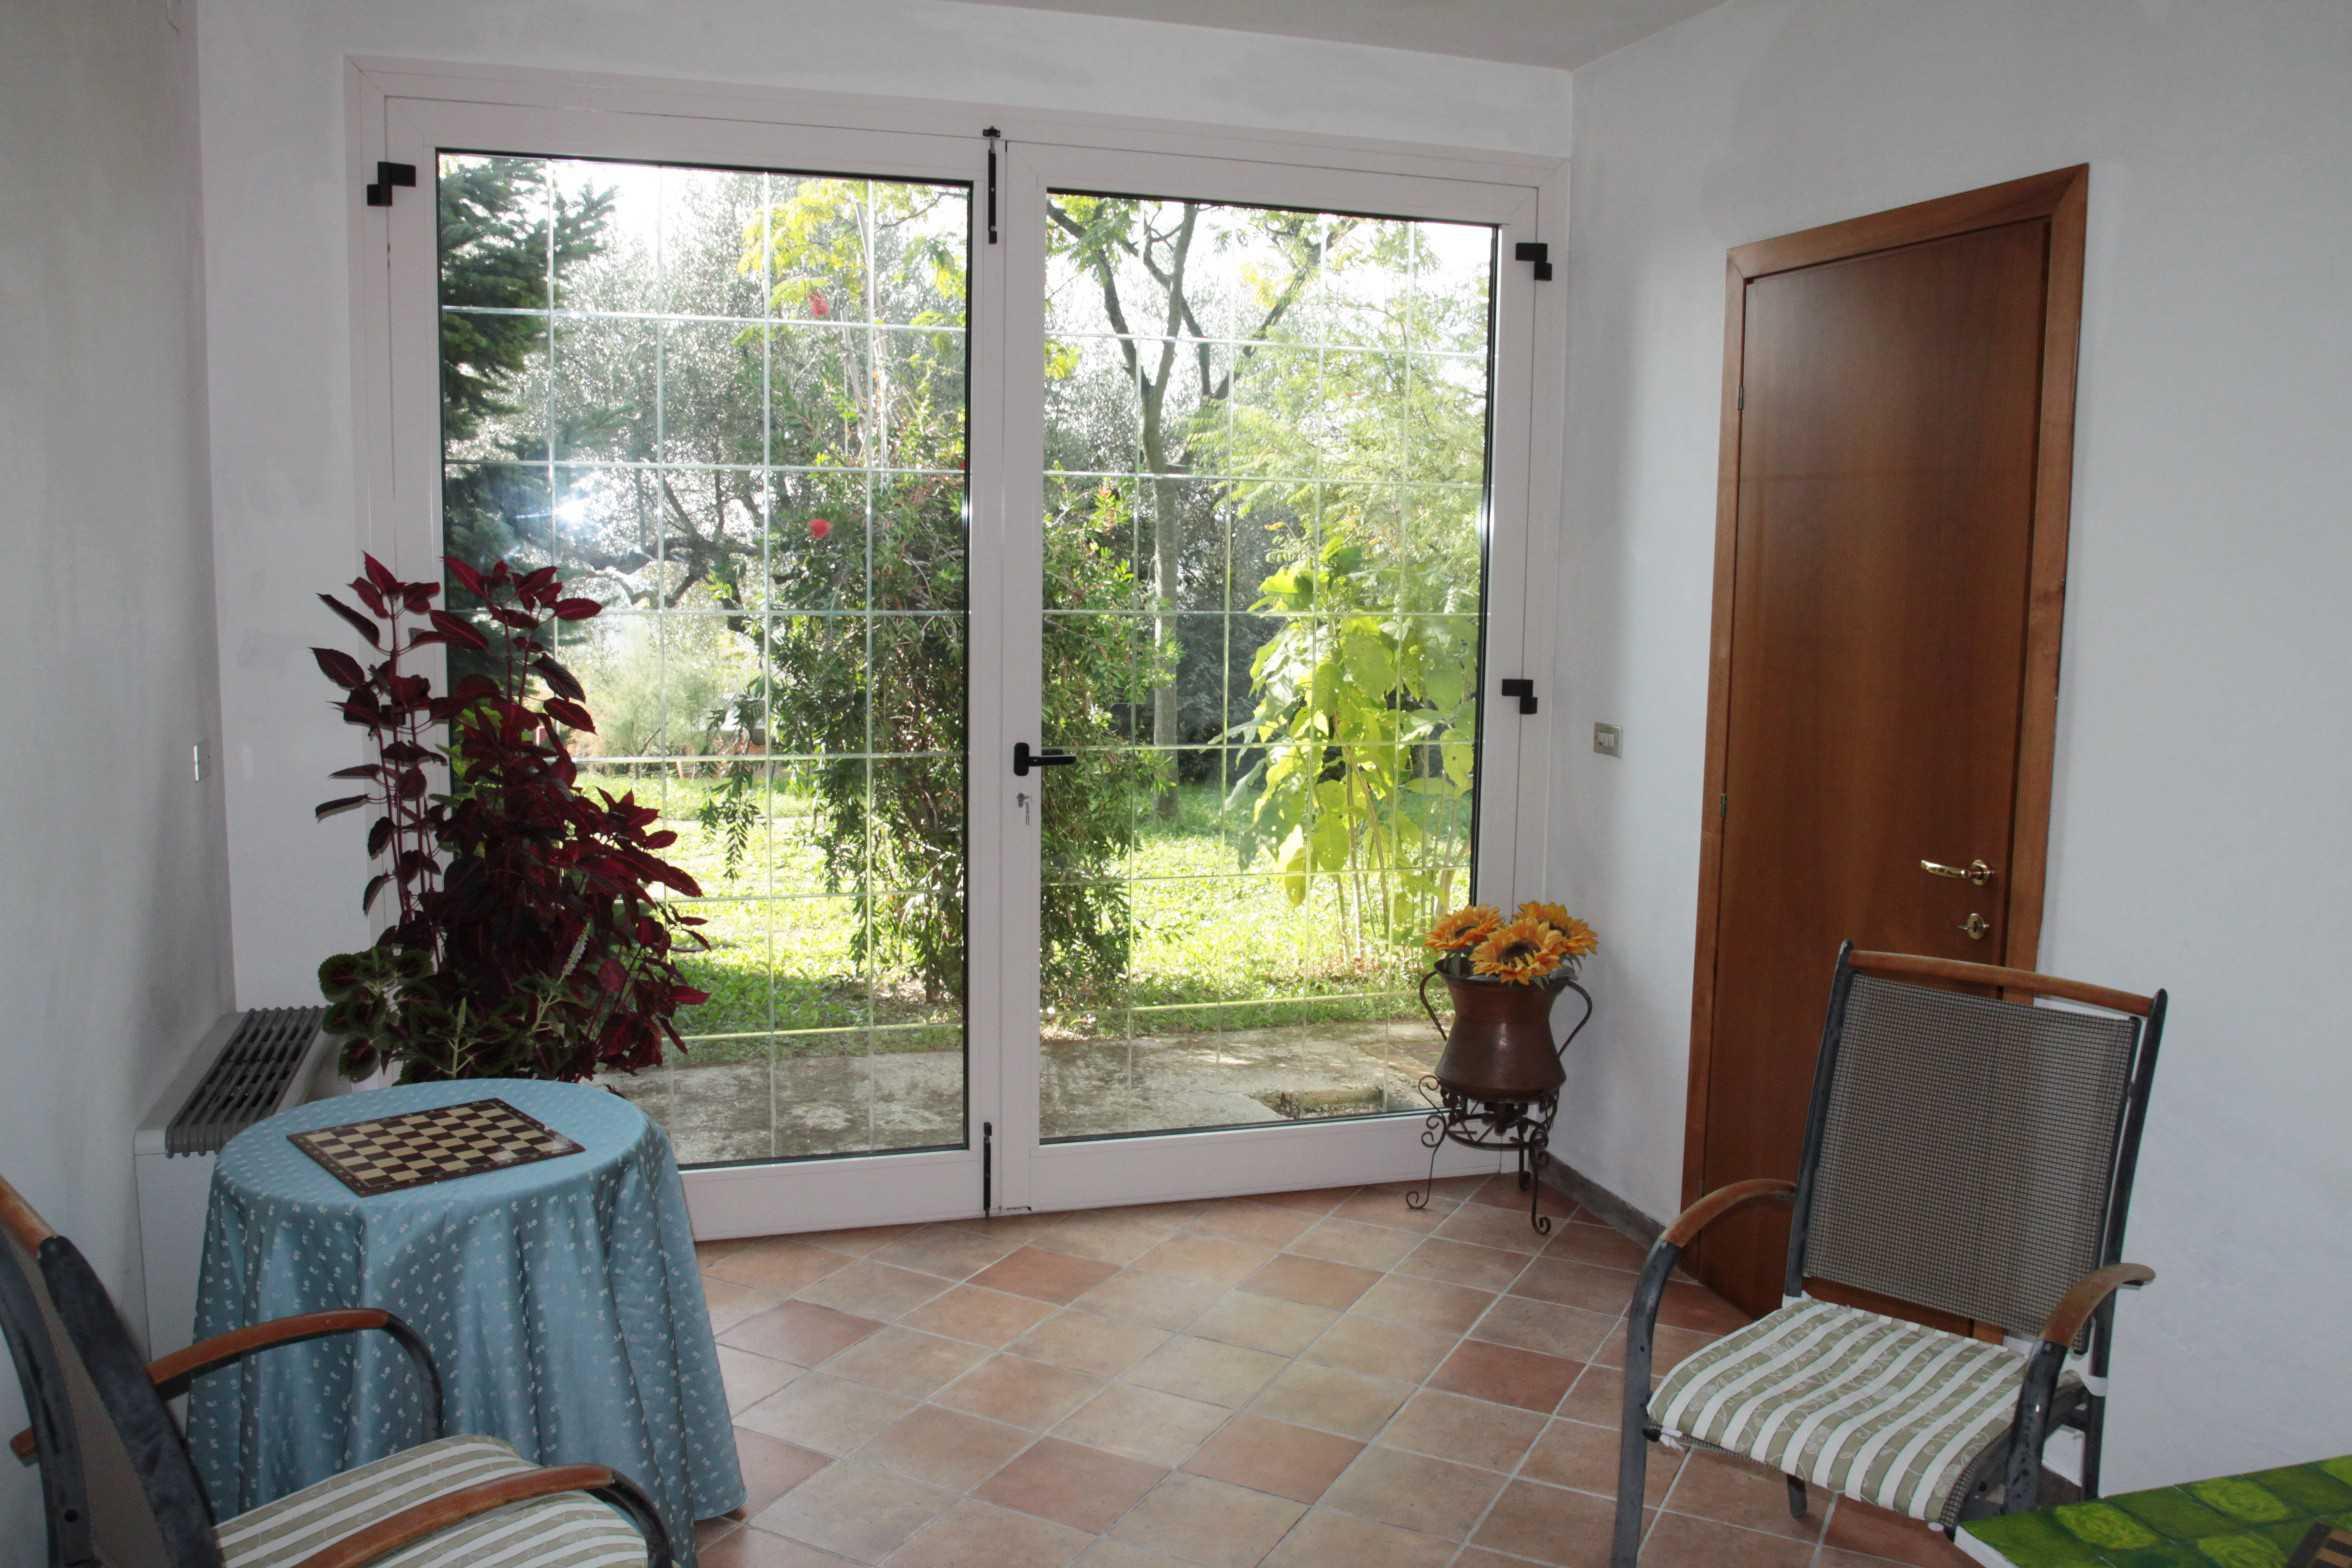 Villa Villa in vendita Atri (TE), Villa Paola - Atri - EUR 471.071 150